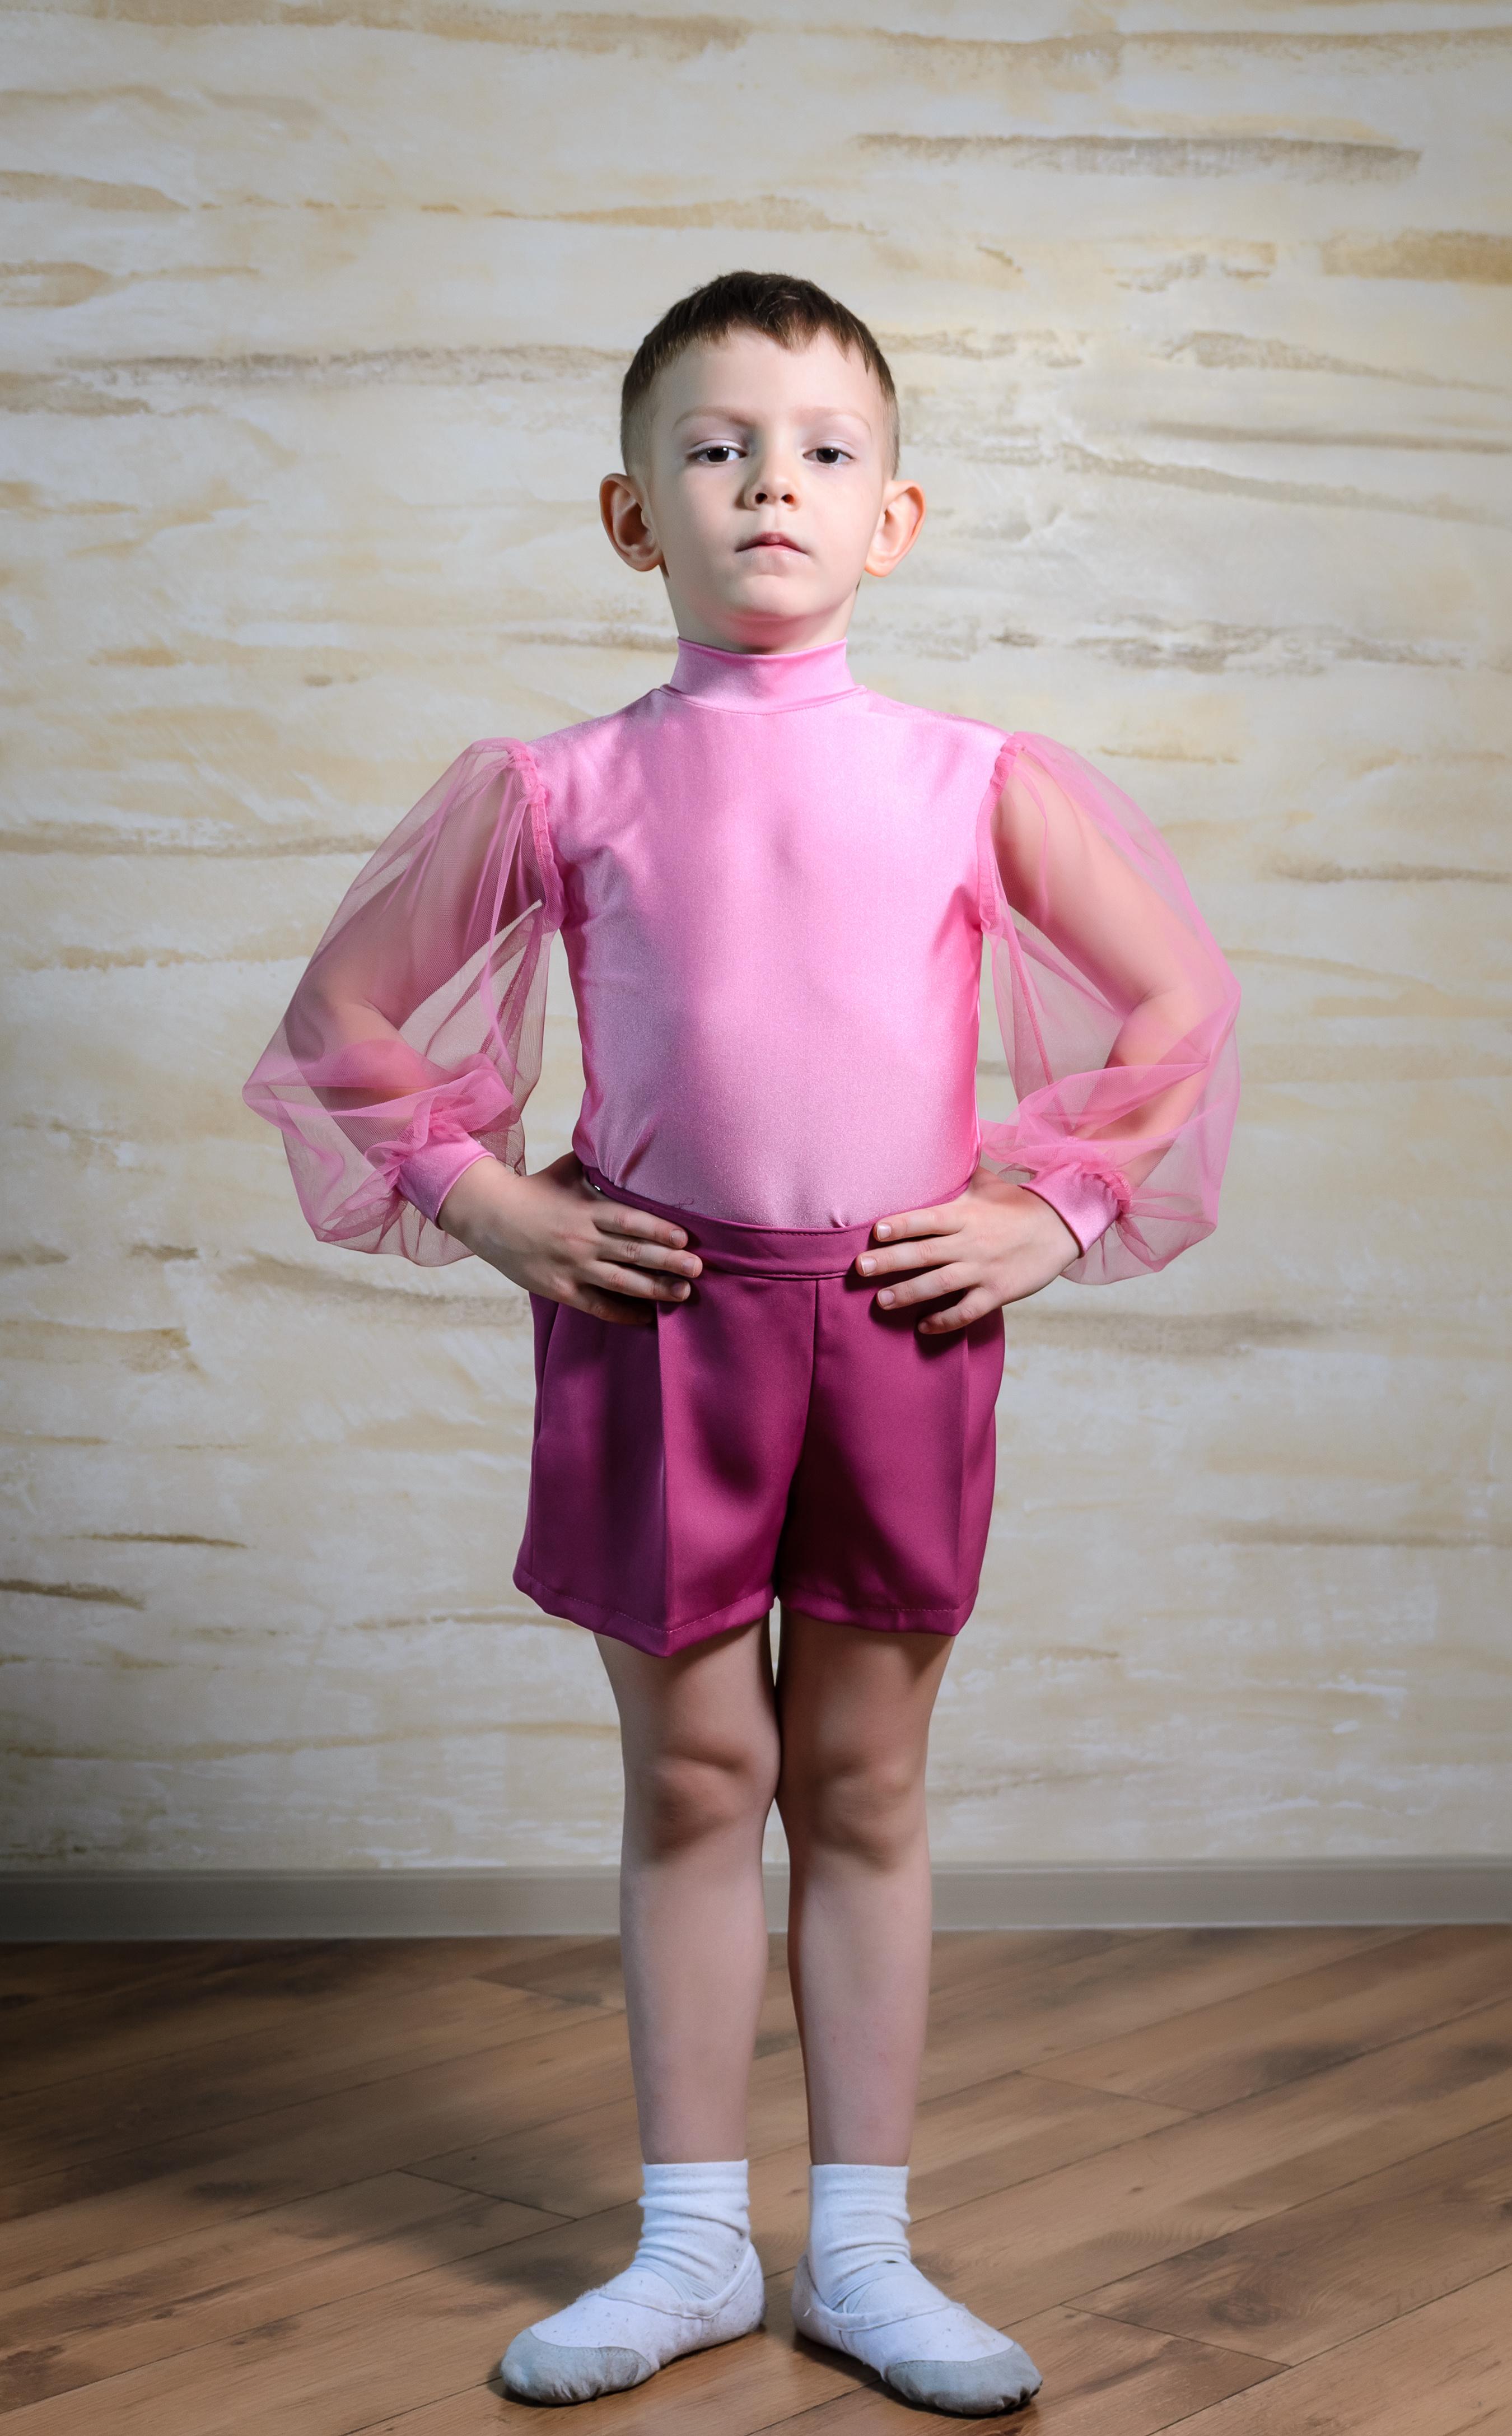 4 year old boy prefers girly clothing